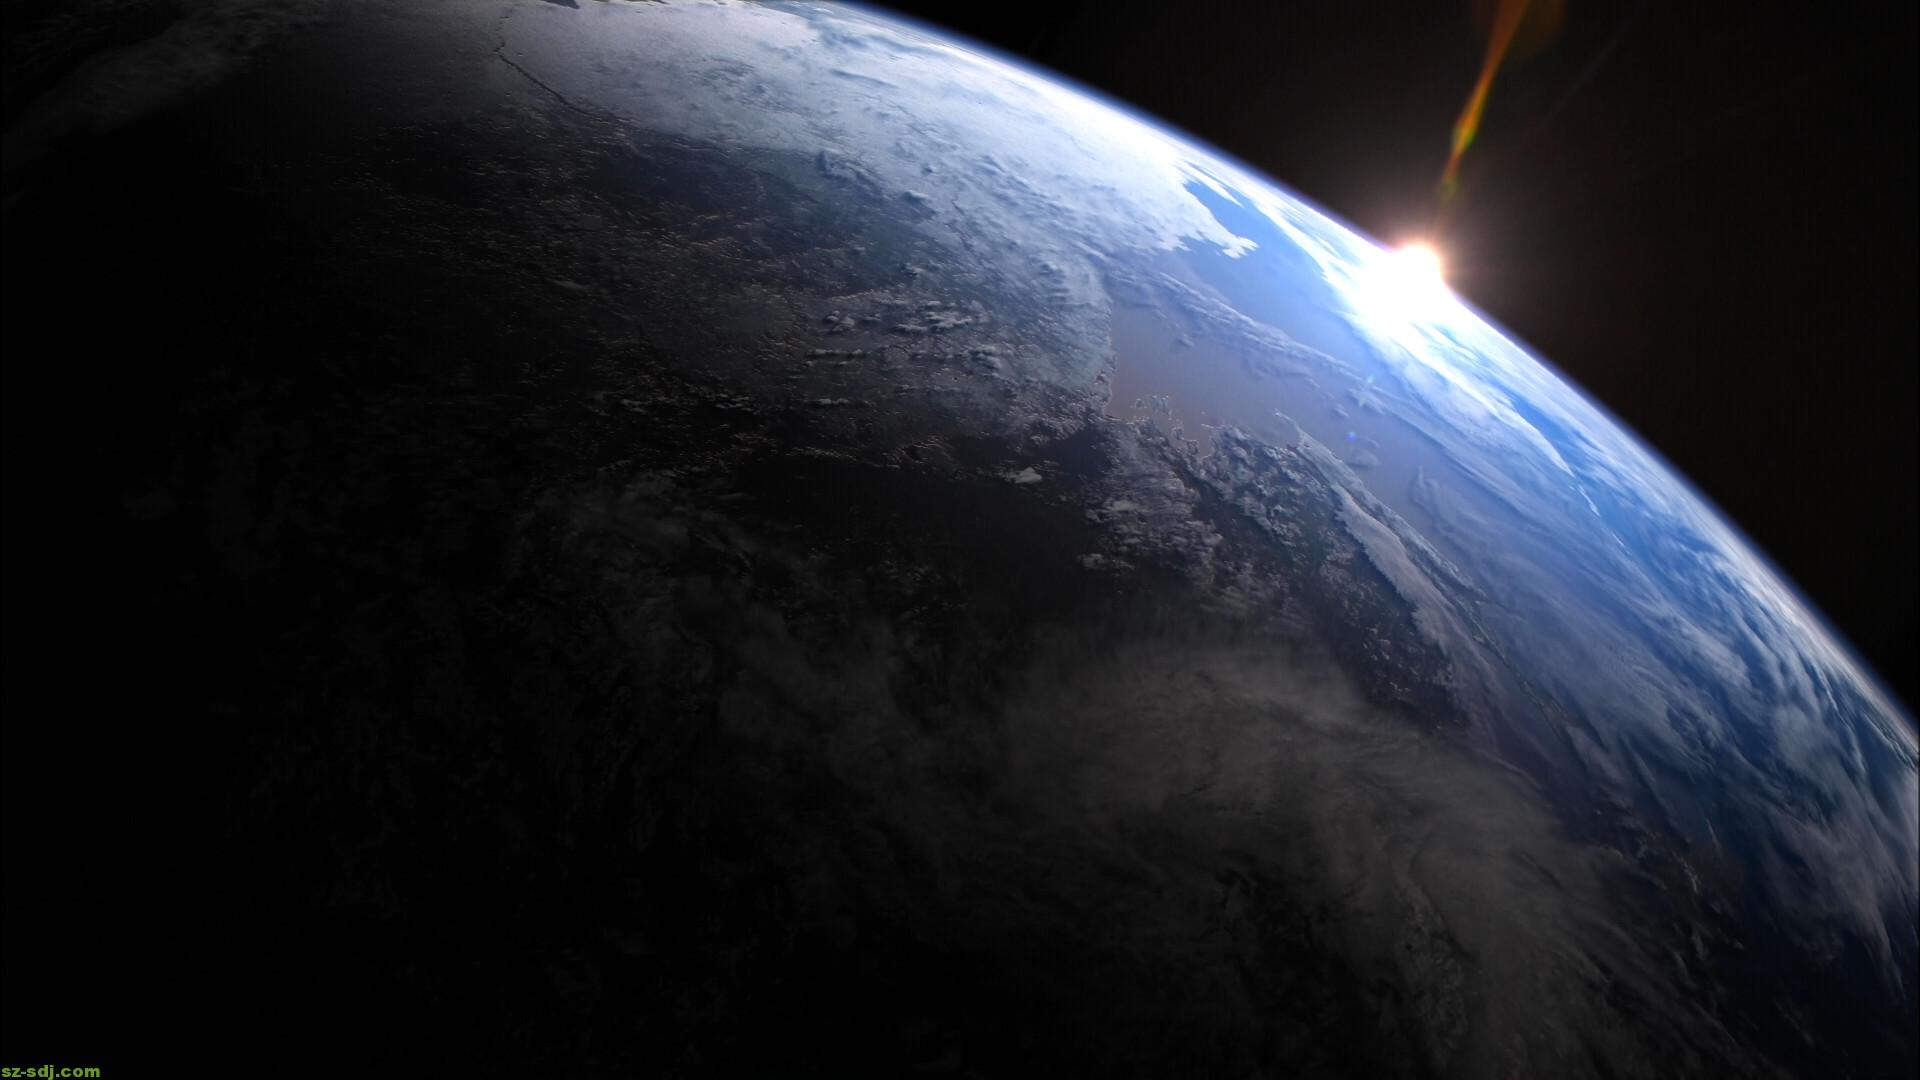 beautiful planet earth wallpaper 28101 | enews